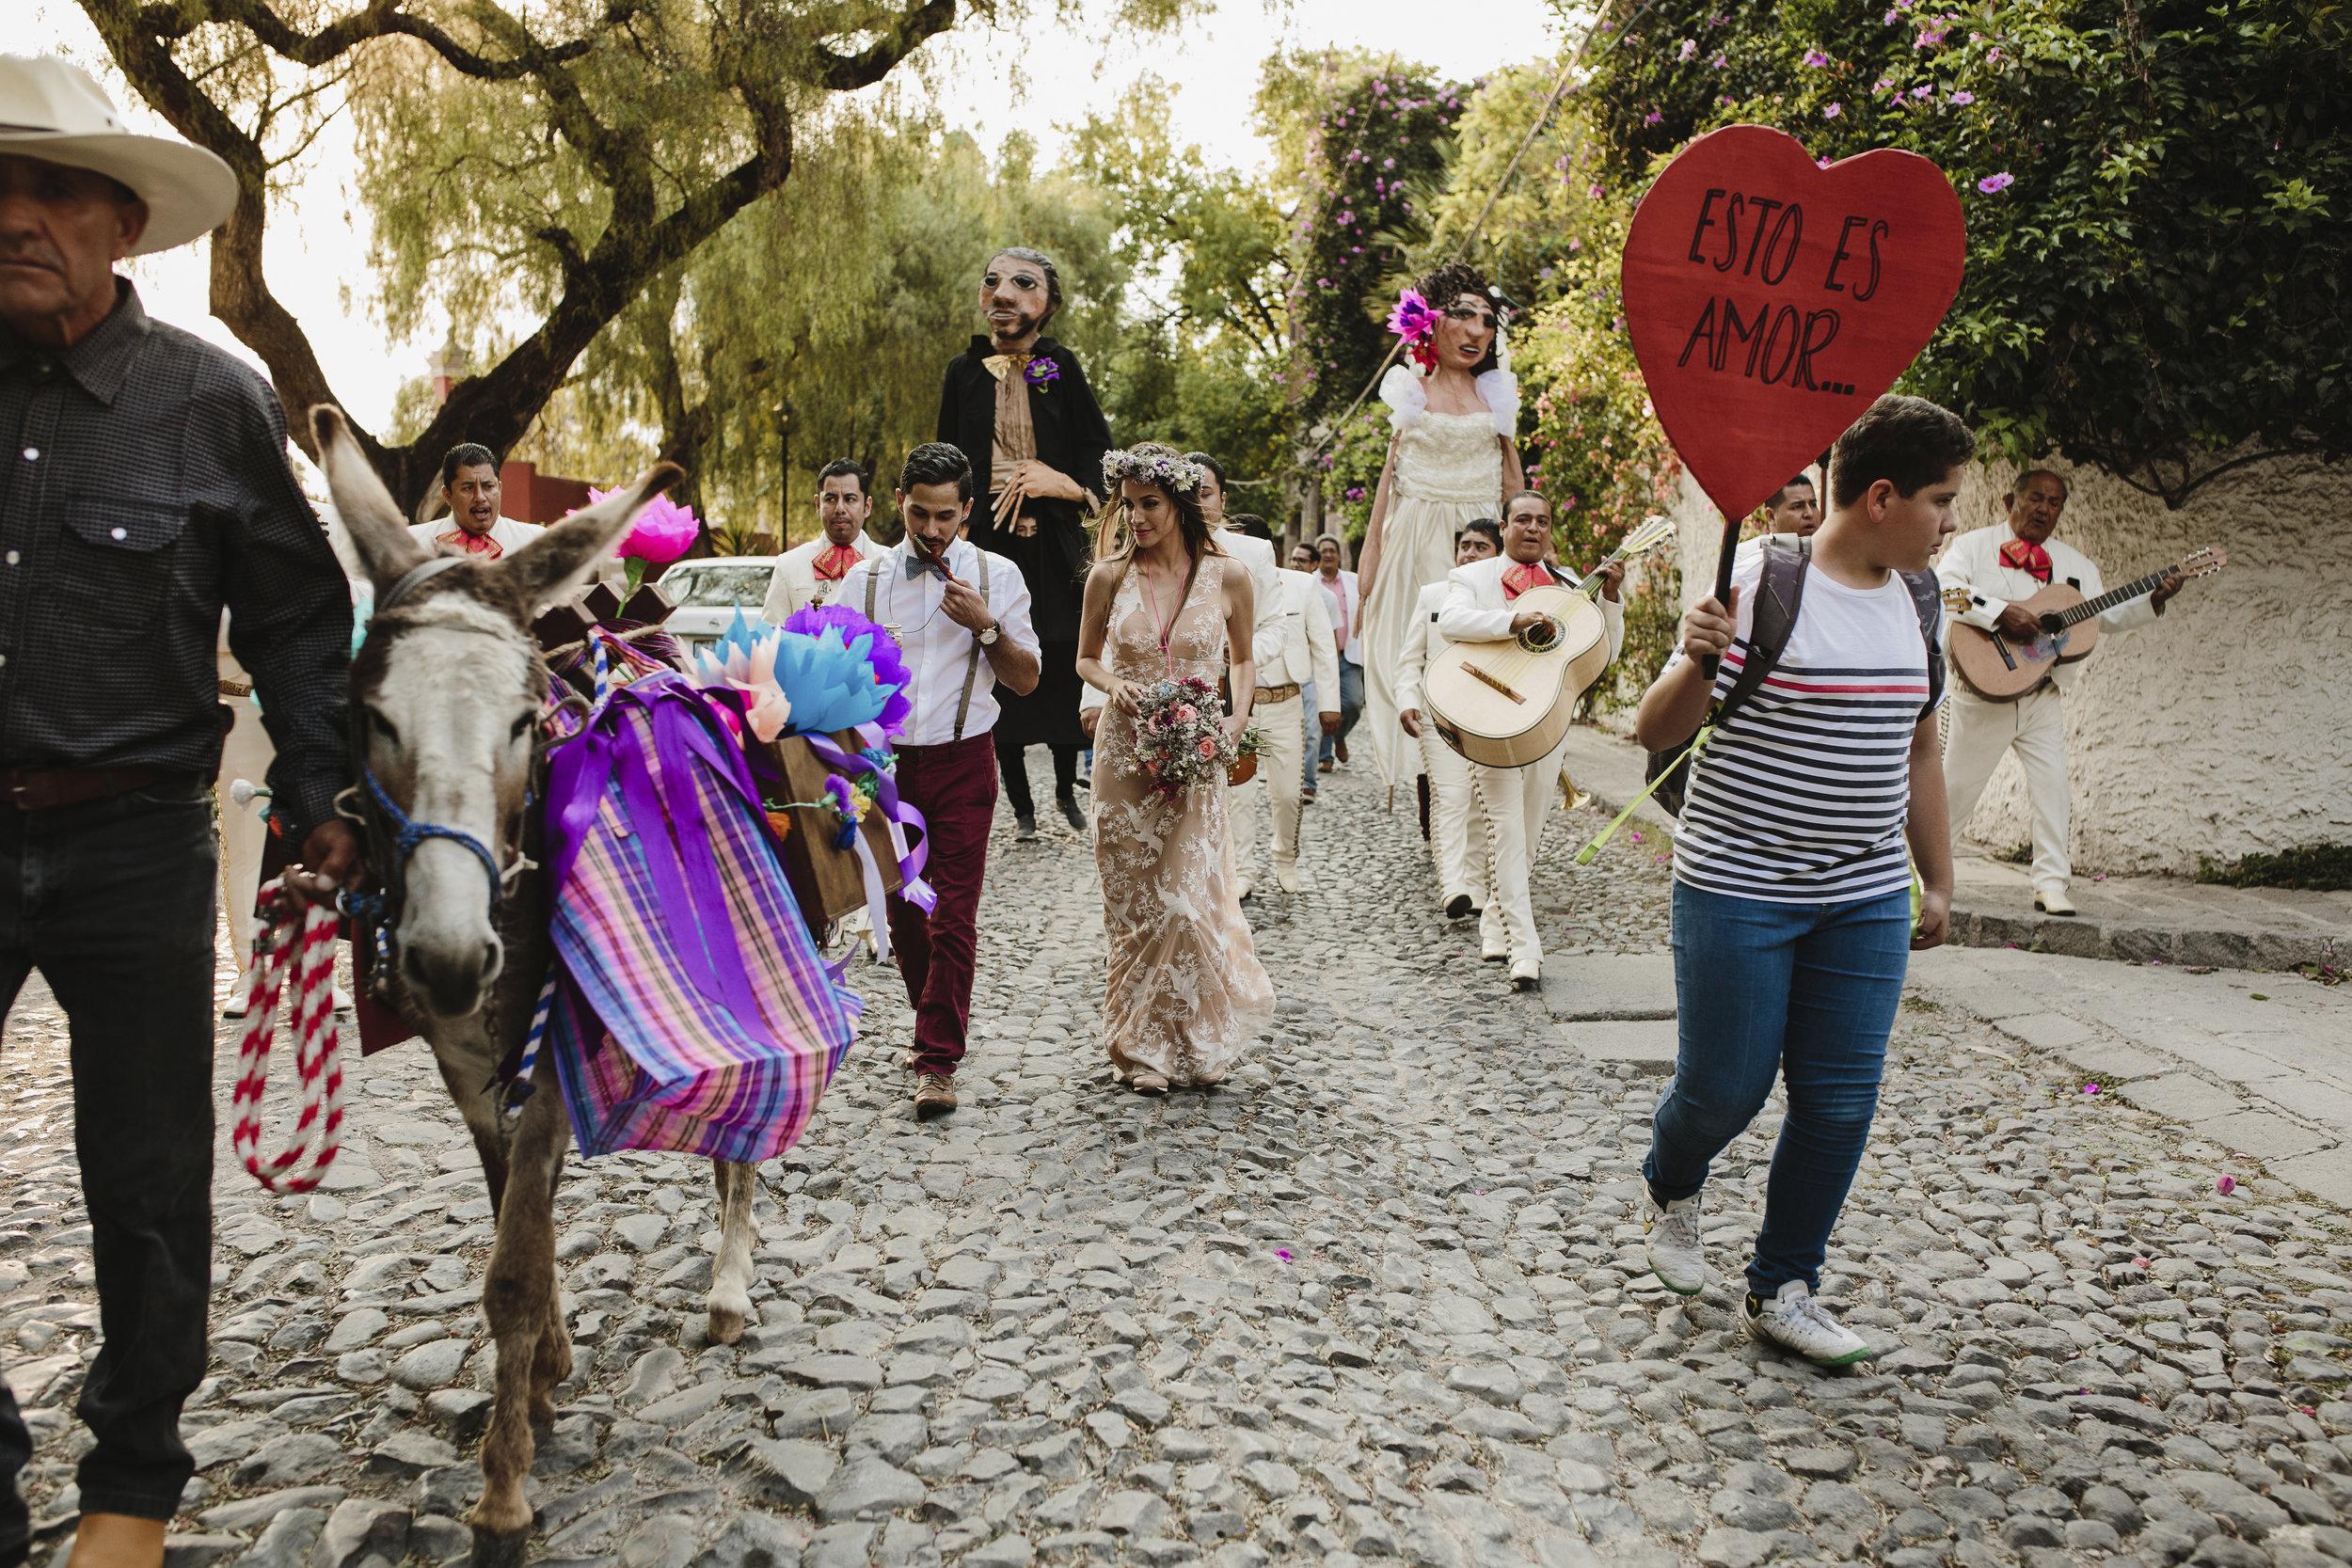 alfons_flores_destination_wedding_photography_mavi_david-287.JPG